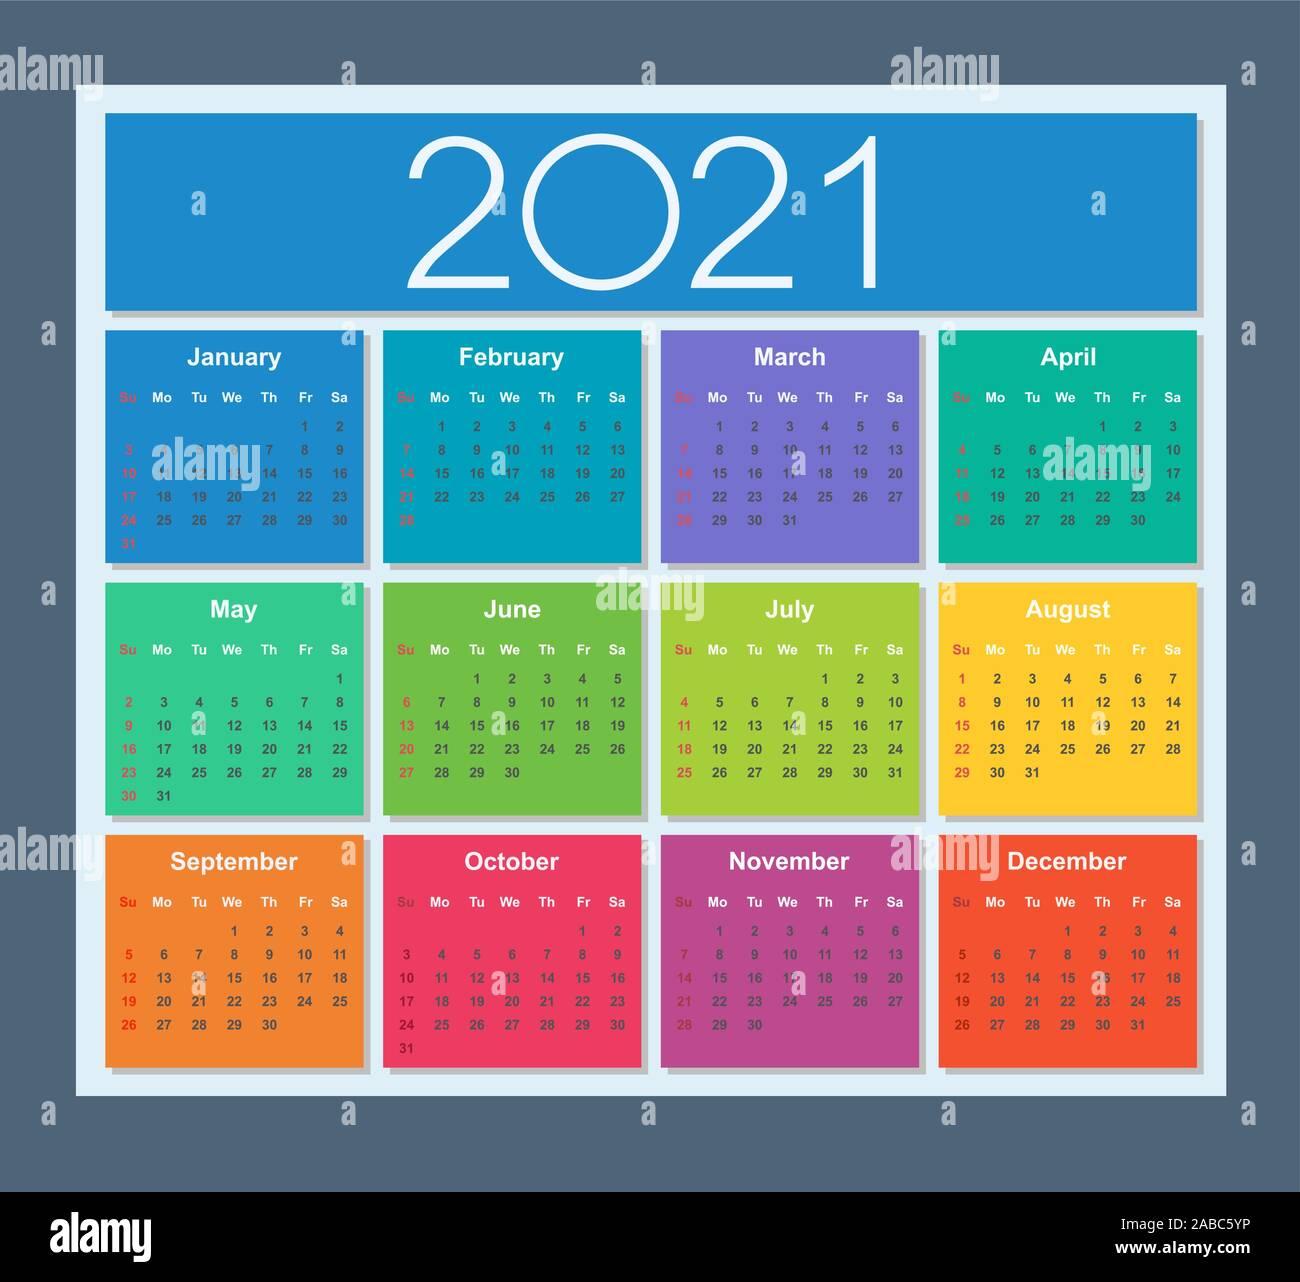 Calendar 2021 Stock Photos & Calendar 2021 Stock Images ...